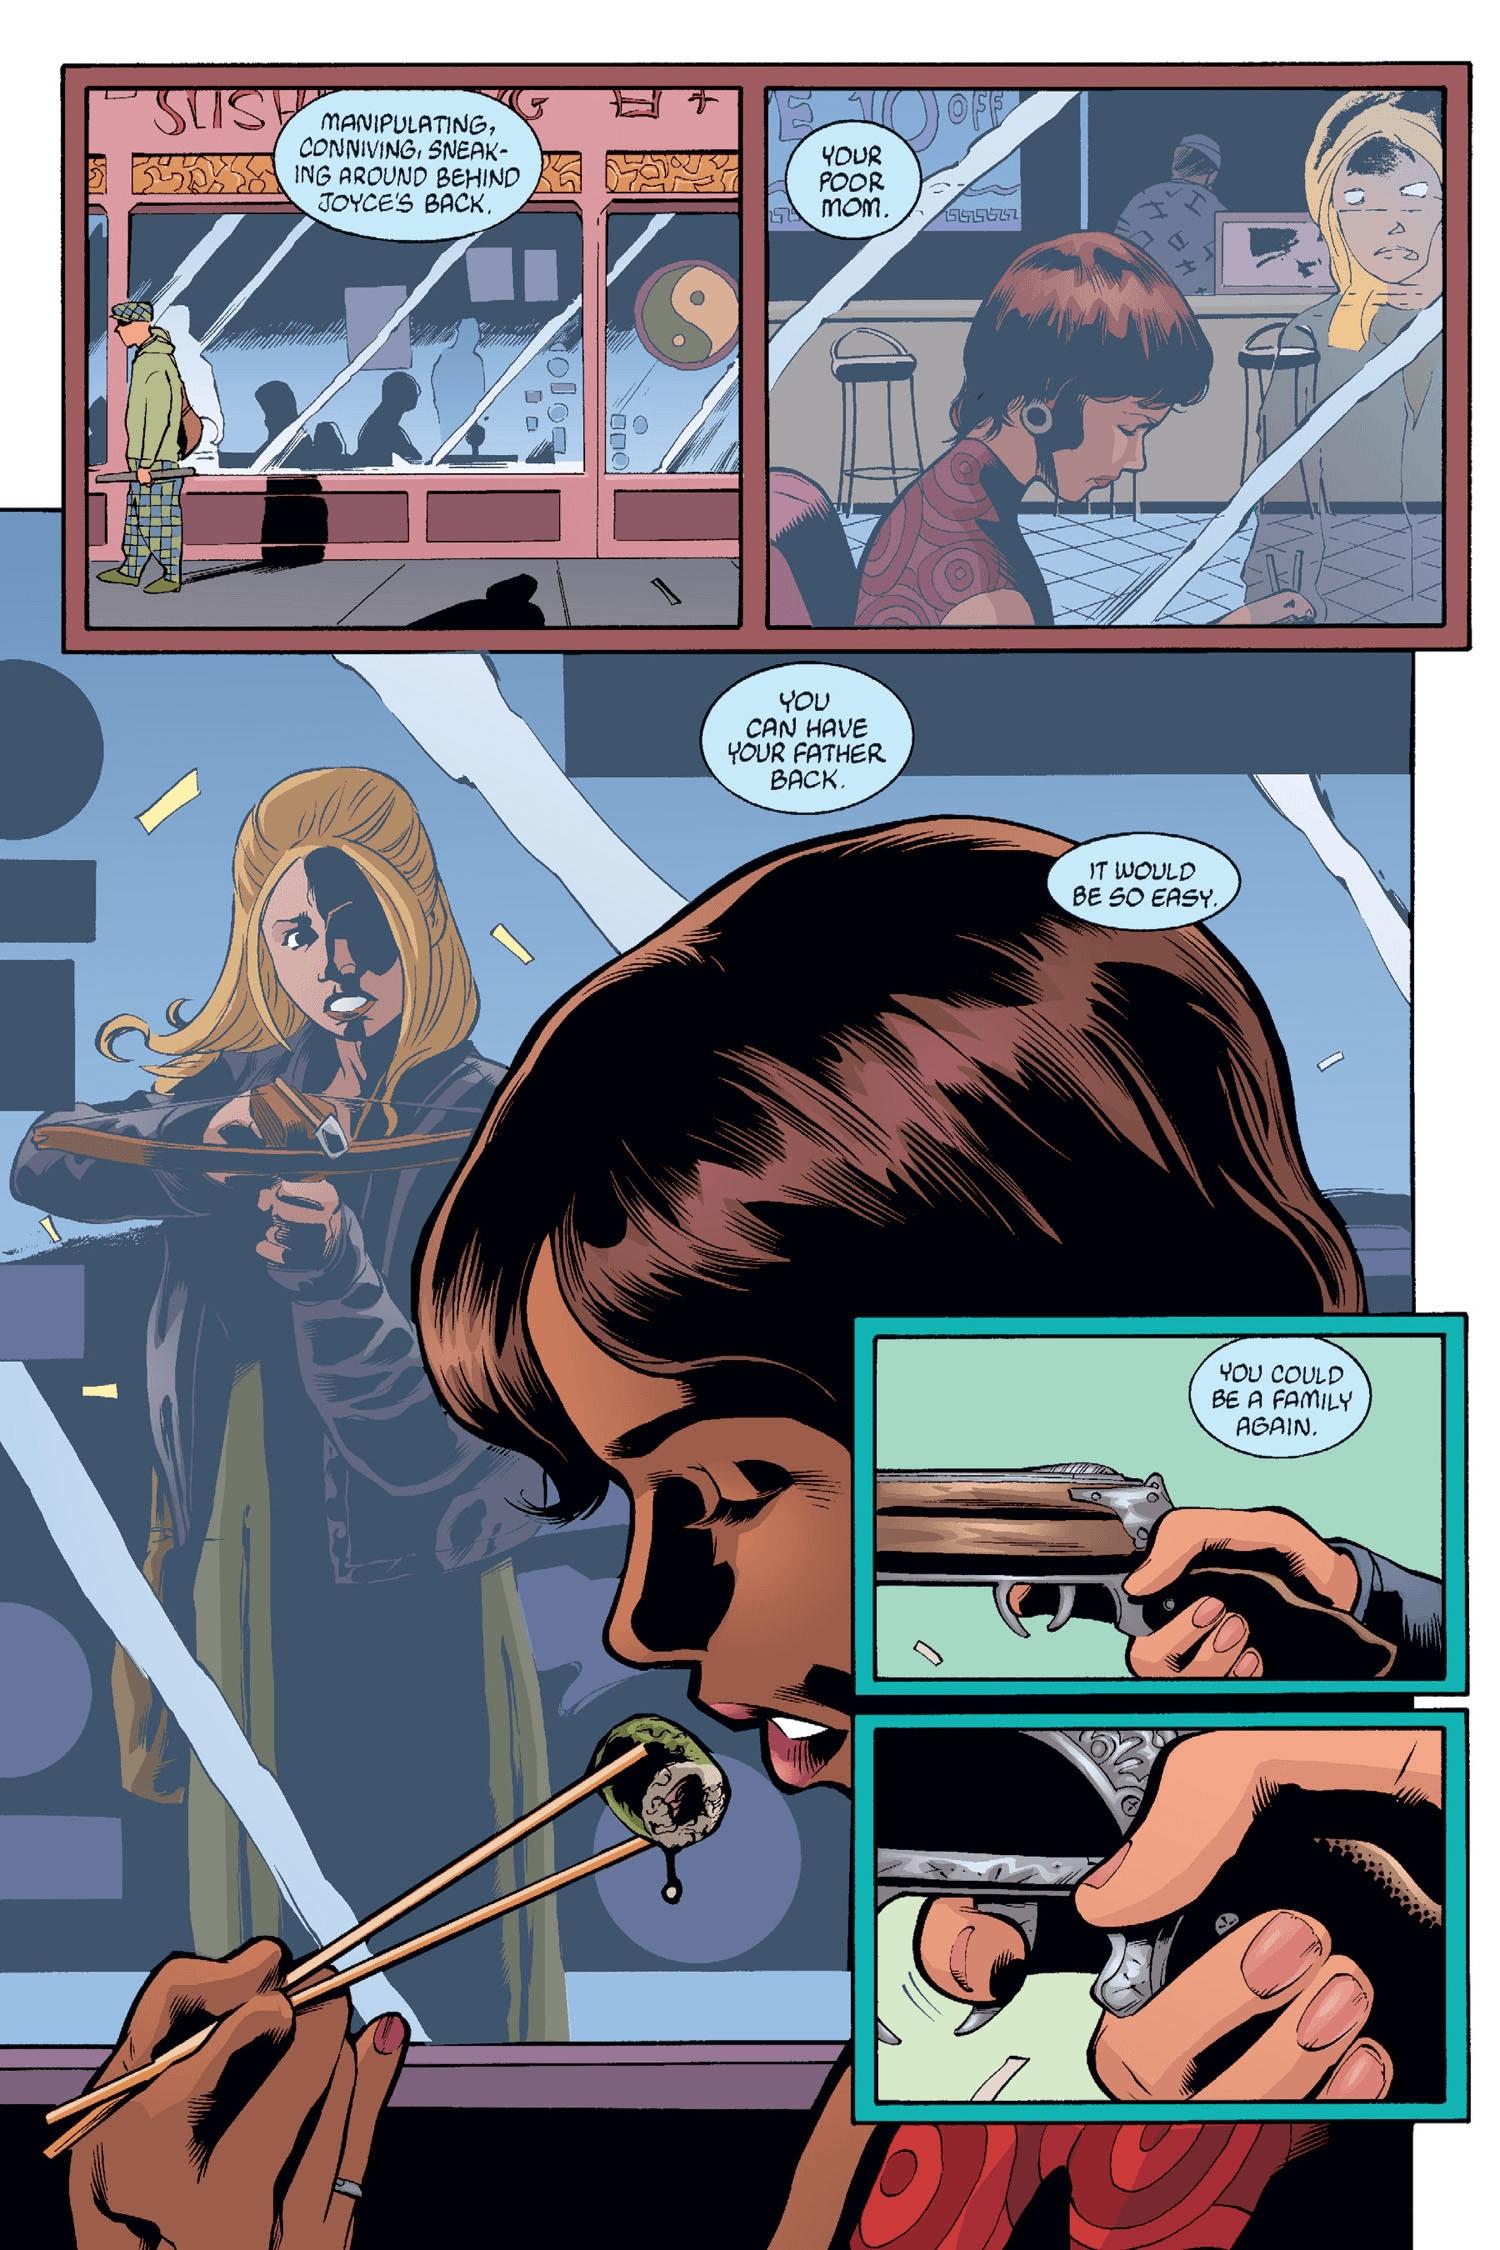 Read online Buffy the Vampire Slayer: Omnibus comic -  Issue # TPB 2 - 36